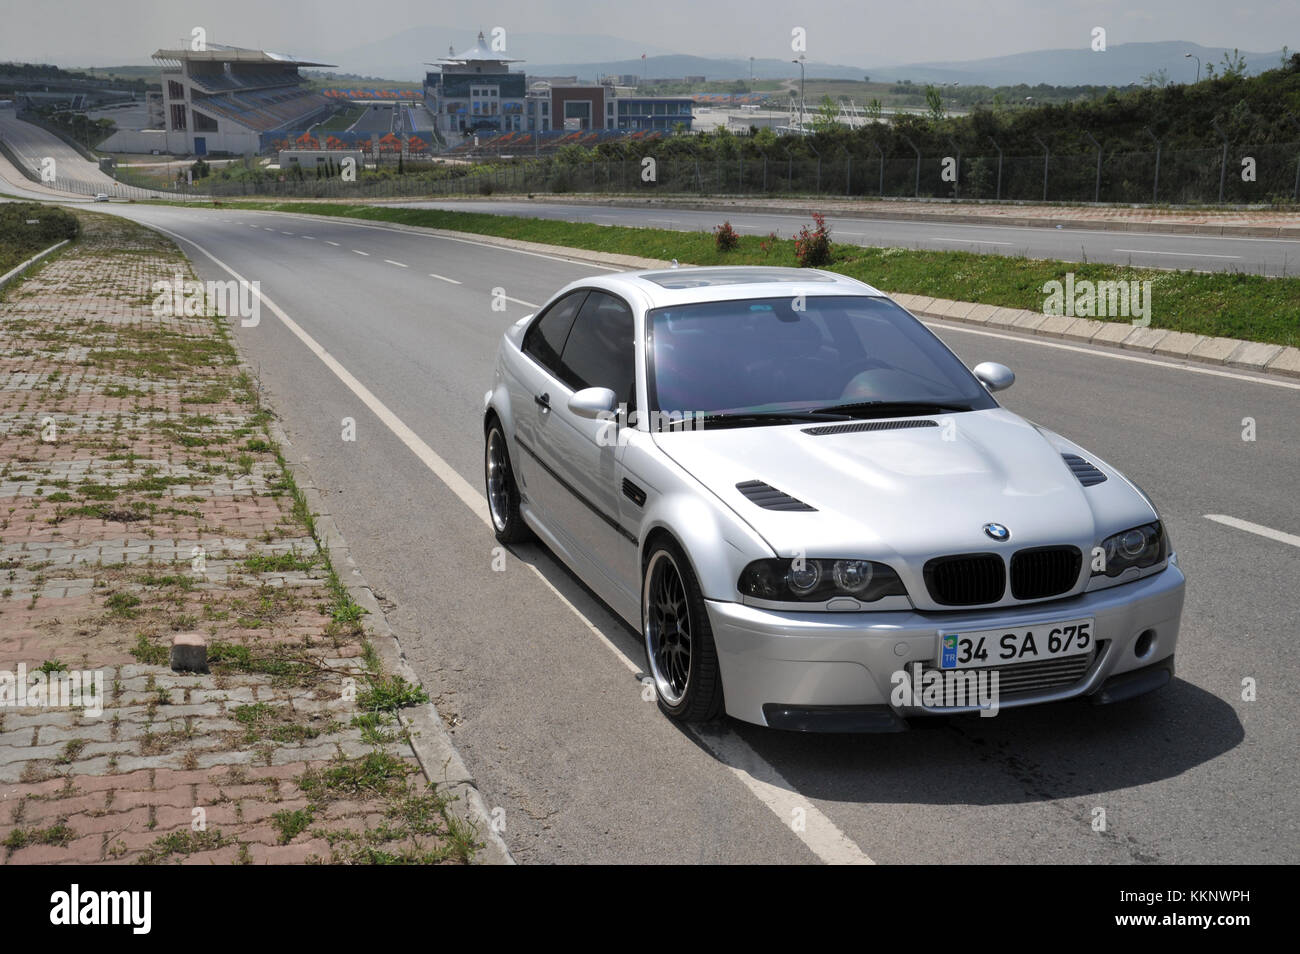 Bmw E46 M3 German Performance Car Stock Photo 167053001 Alamy